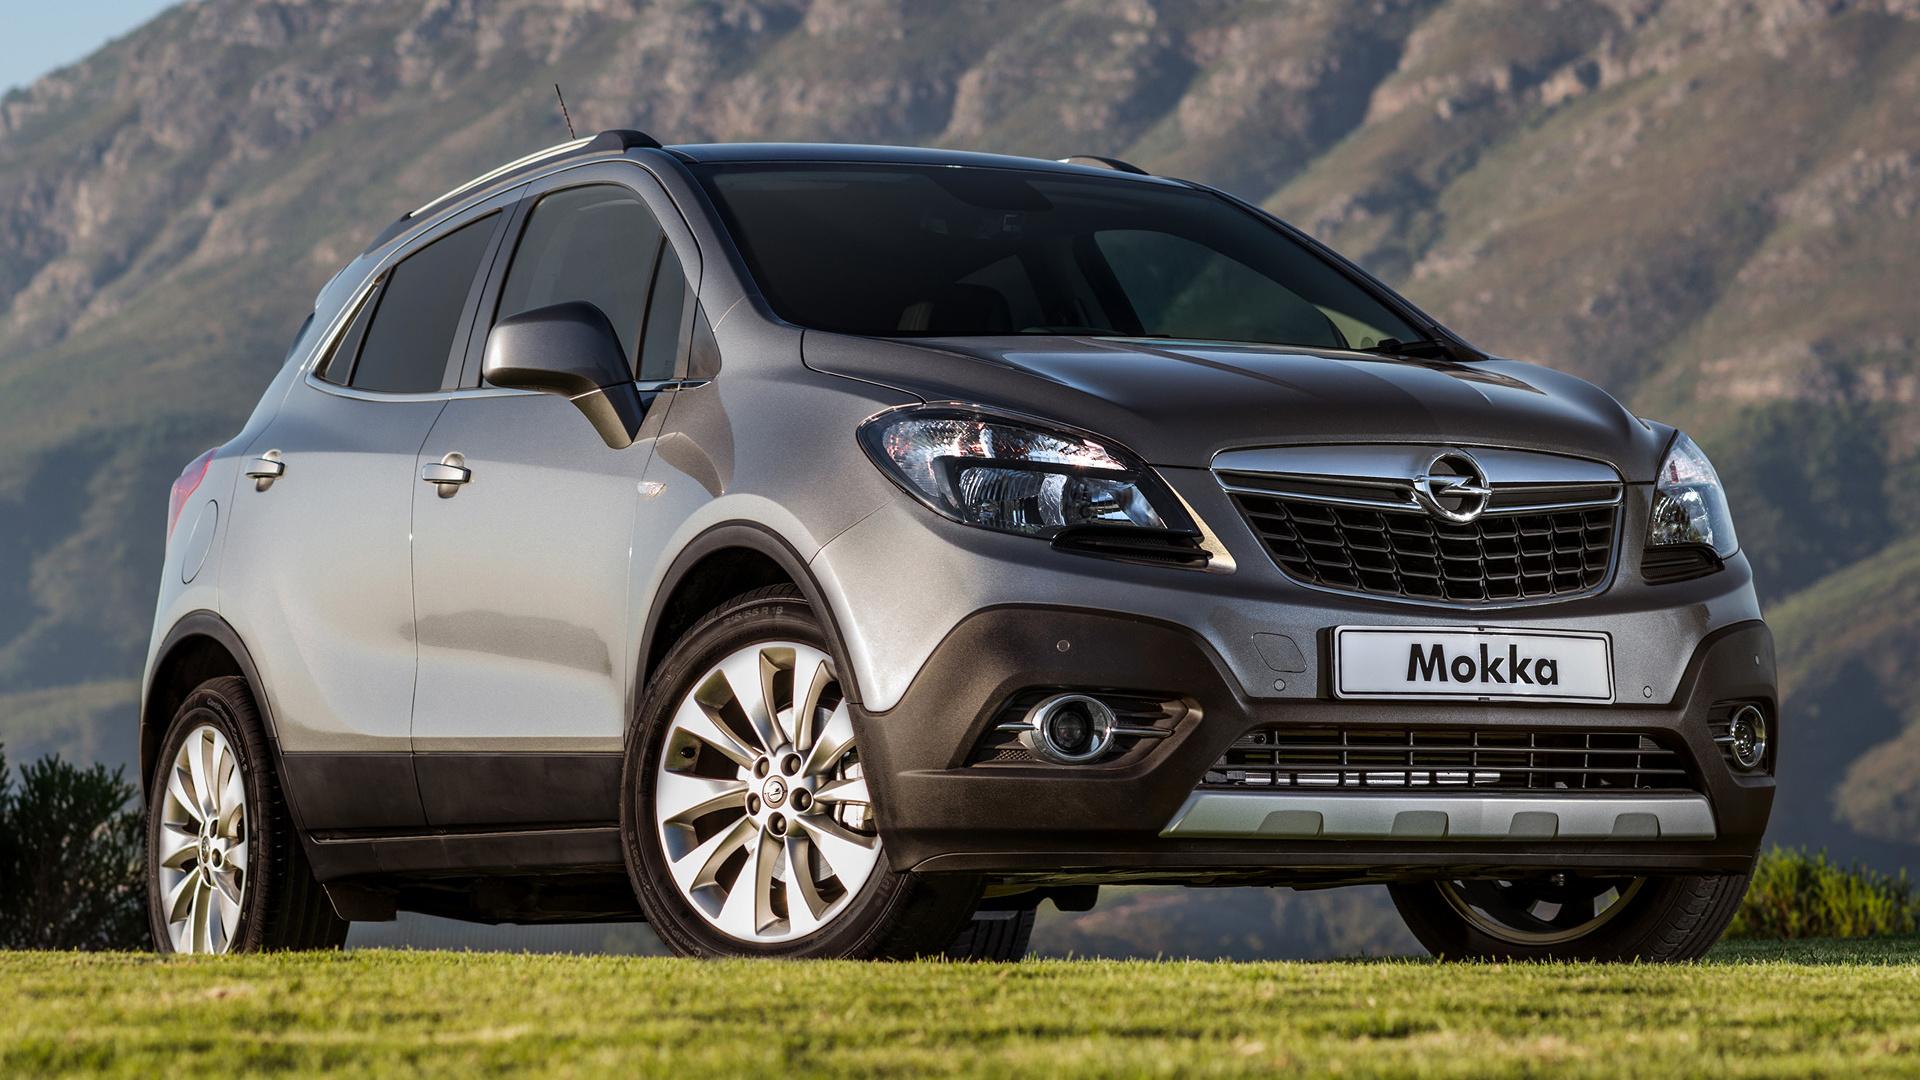 2015 Opel Mokka Turbo Hd Wallpaper Background Image 1920x1080 Id 1100458 Wallpaper Abyss